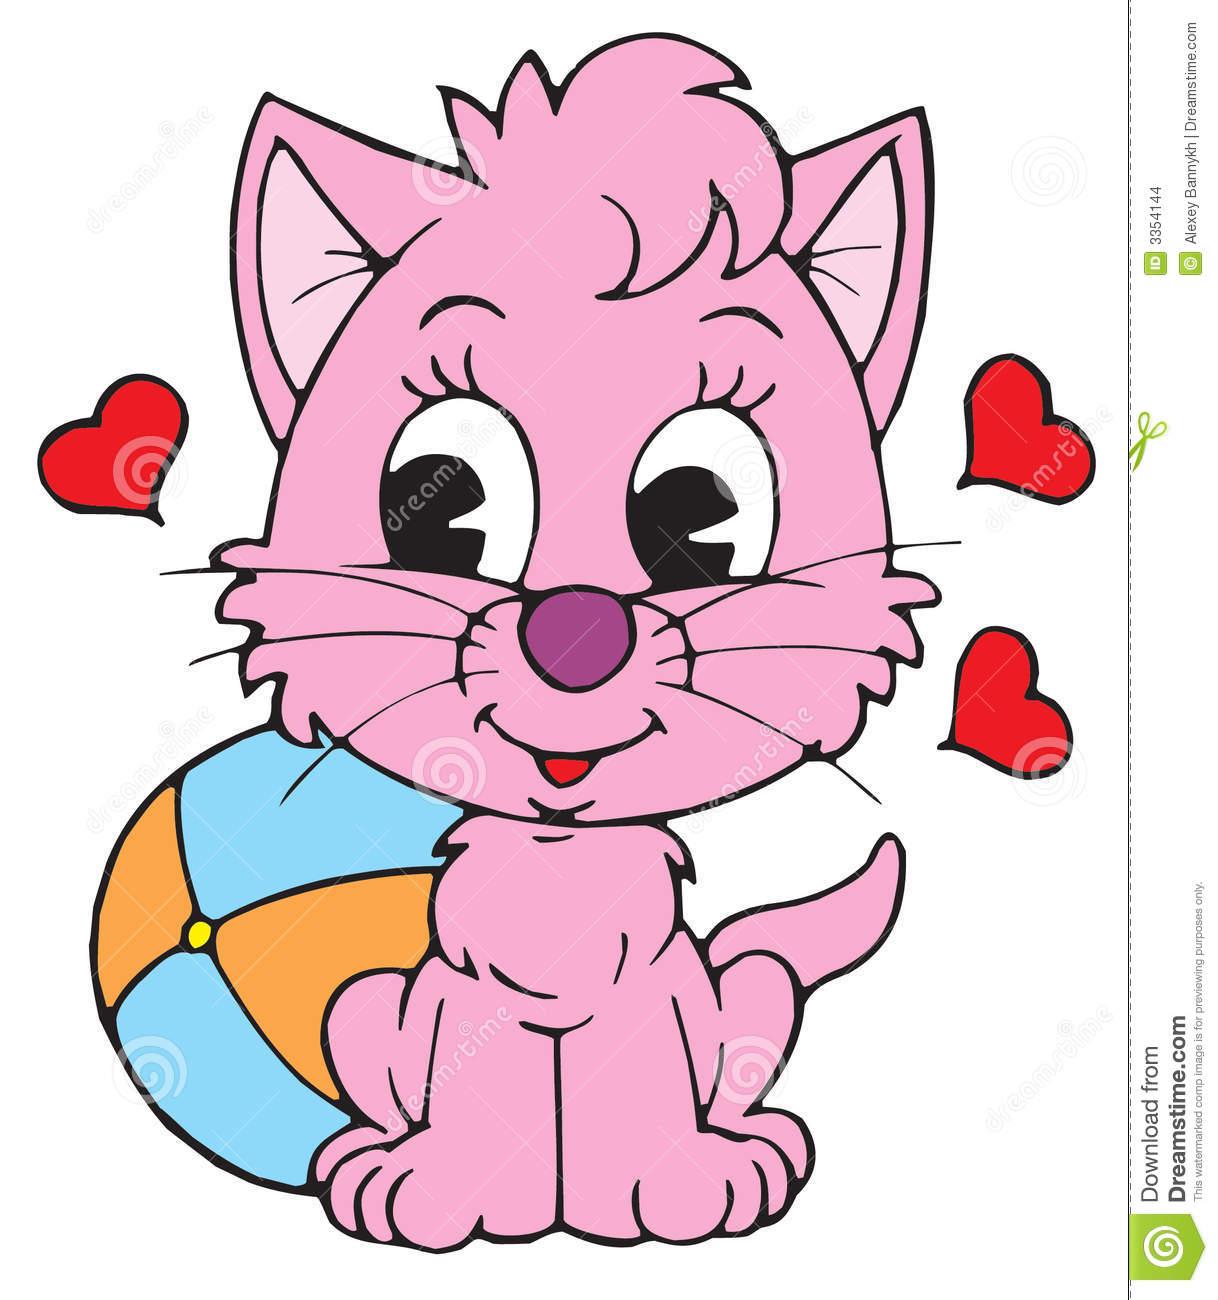 kitty-clip-art-pink-kitty-vector-clip-art-3354144.jpg